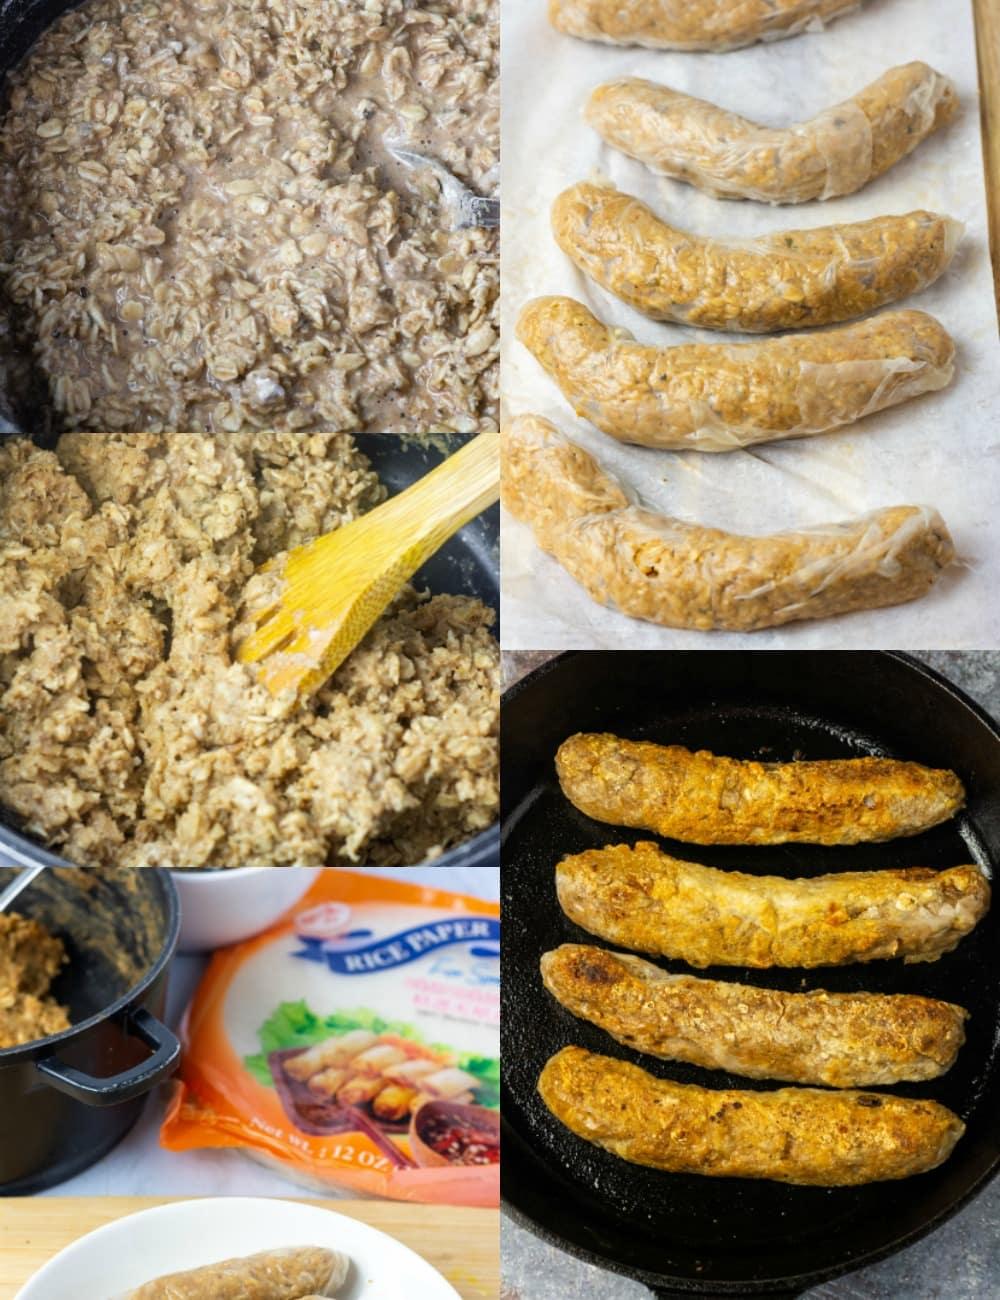 gluten-free vegan sausage steps with ingredients